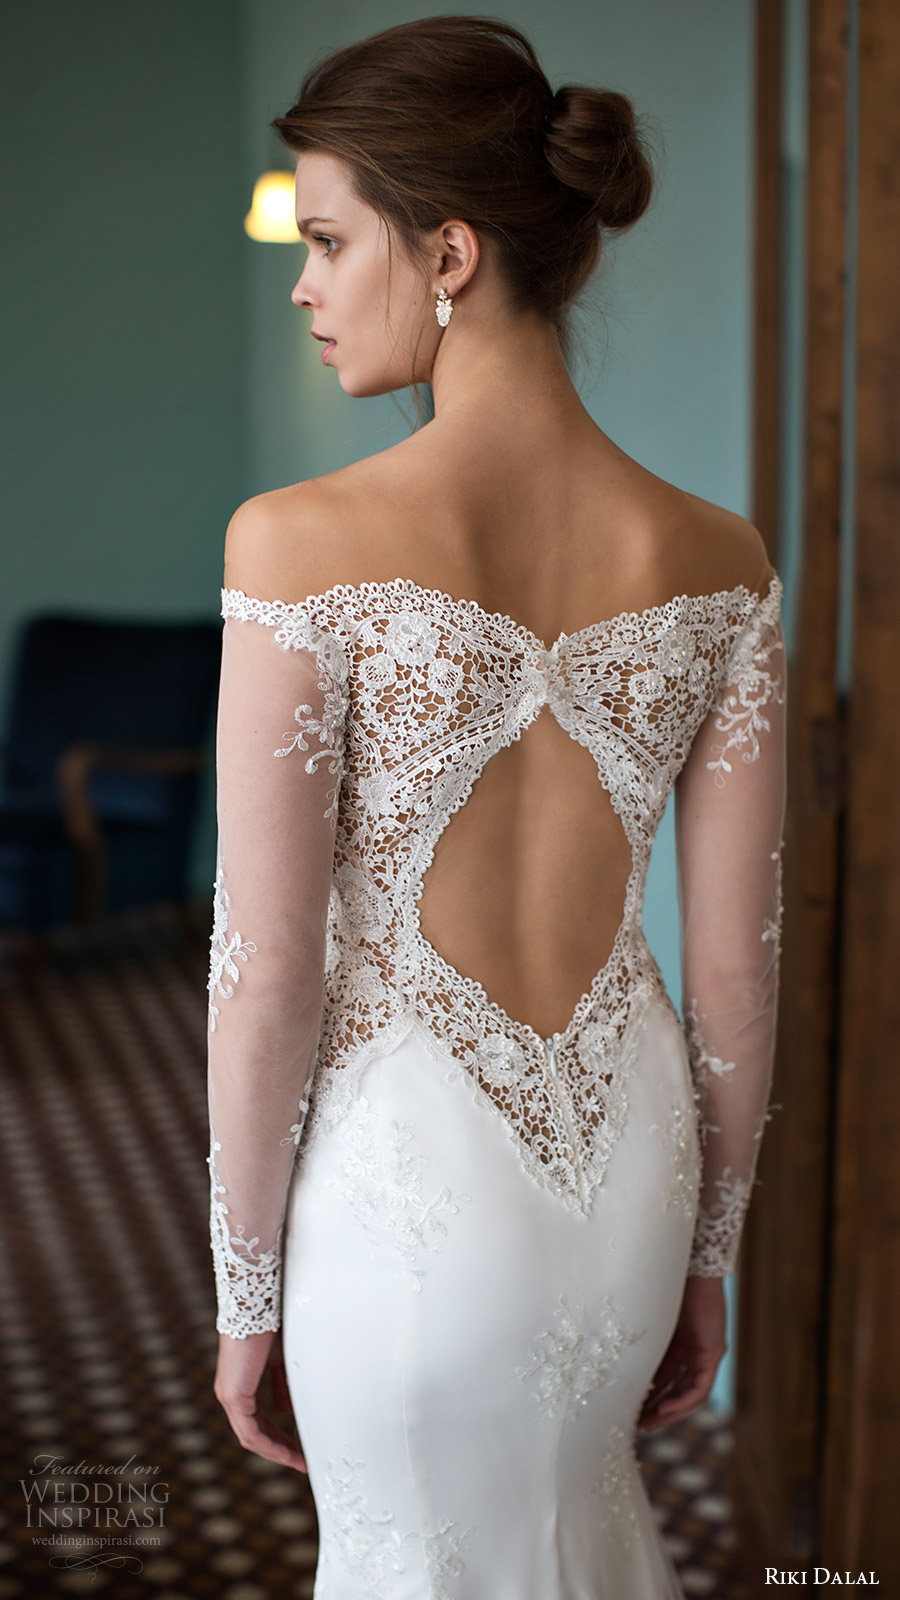 riki dalal bridal 2016 illusion long sleeves off shoulder pluging sweetheart lace sheath wedding dress (1810) zv elegant pretty romantic keyhole